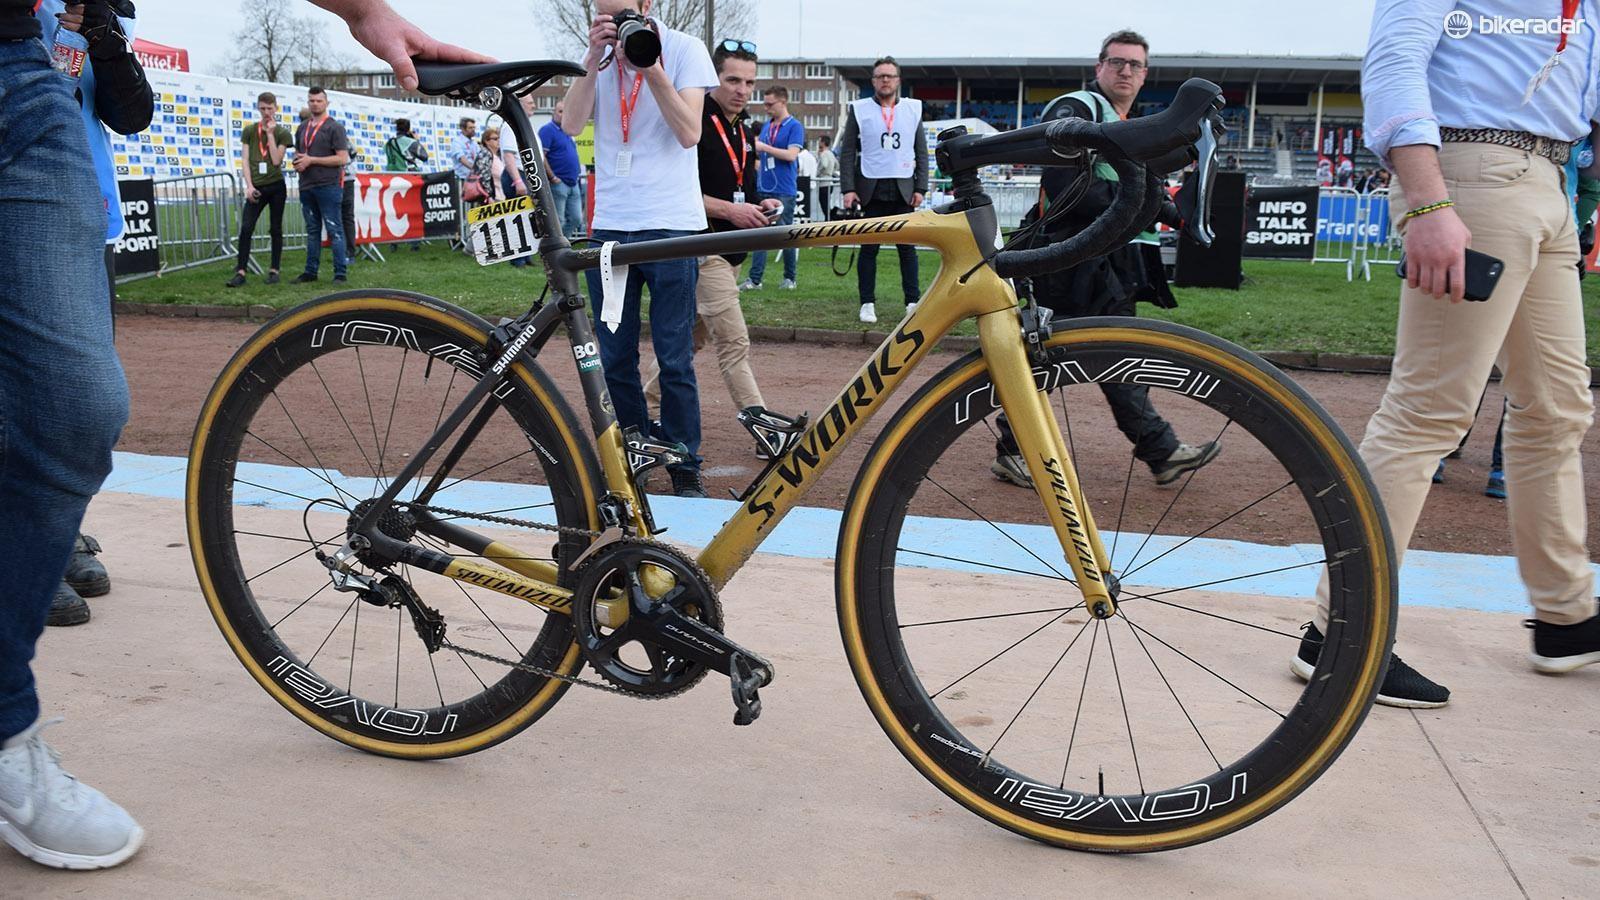 Peter Sagan's Paris-Roubaix winning 'Sagan Collection' S-Works Roubaix Rim Brake